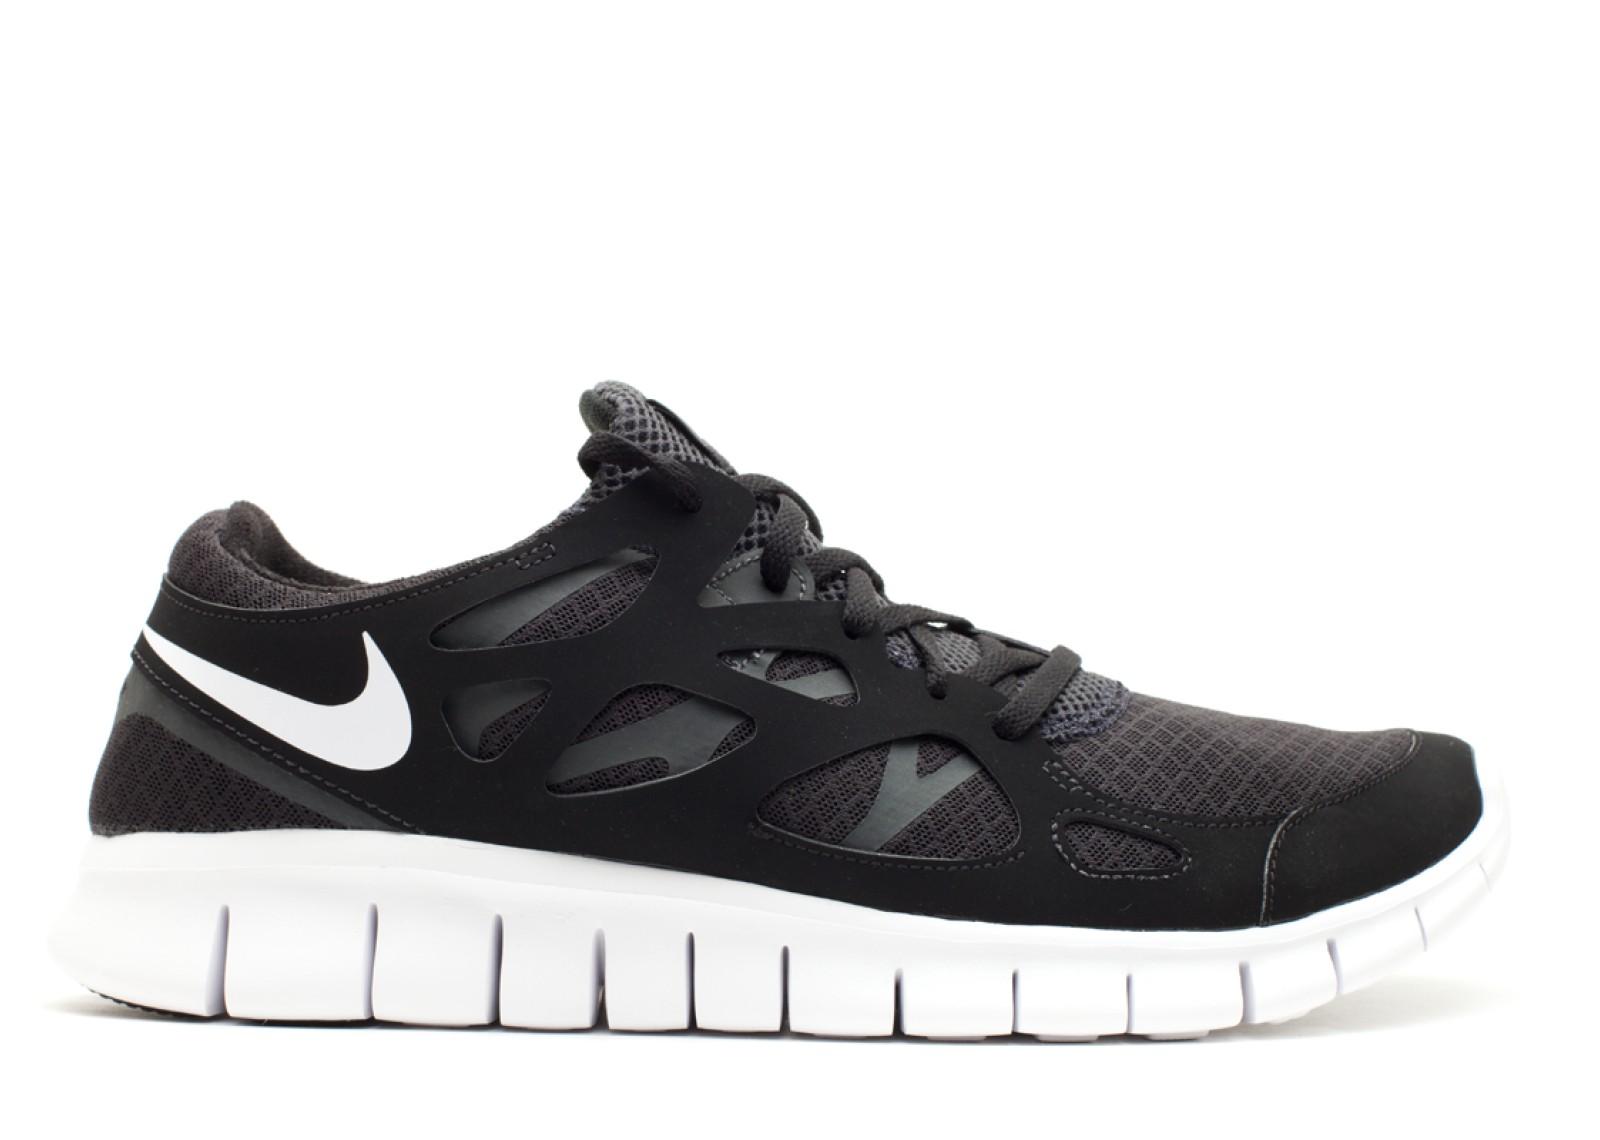 separation shoes 5f22e 48488 Prev Free Run 2 White Black Anthracite 443815-010